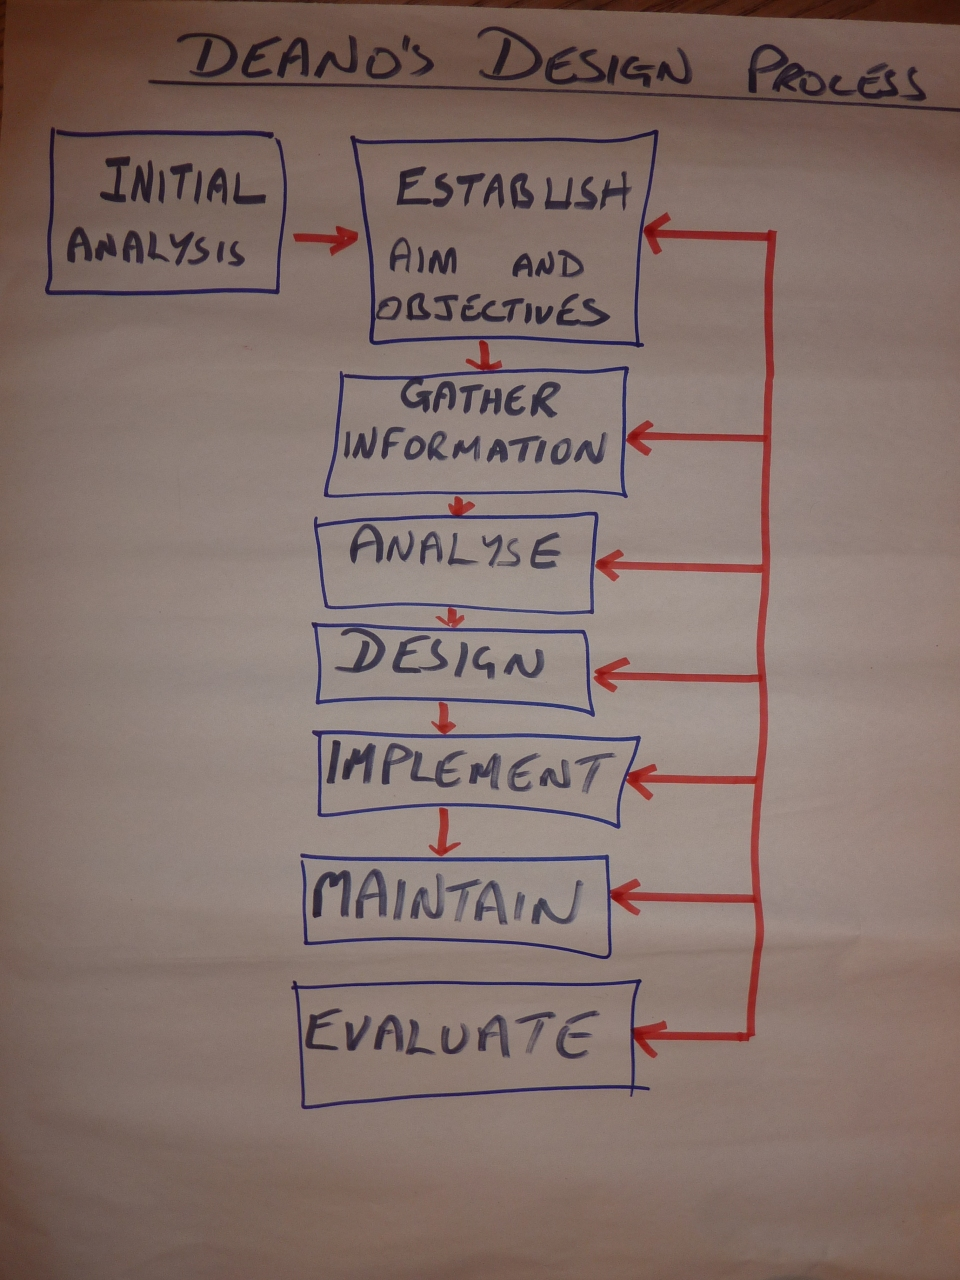 Deano's Permaculture Design Process